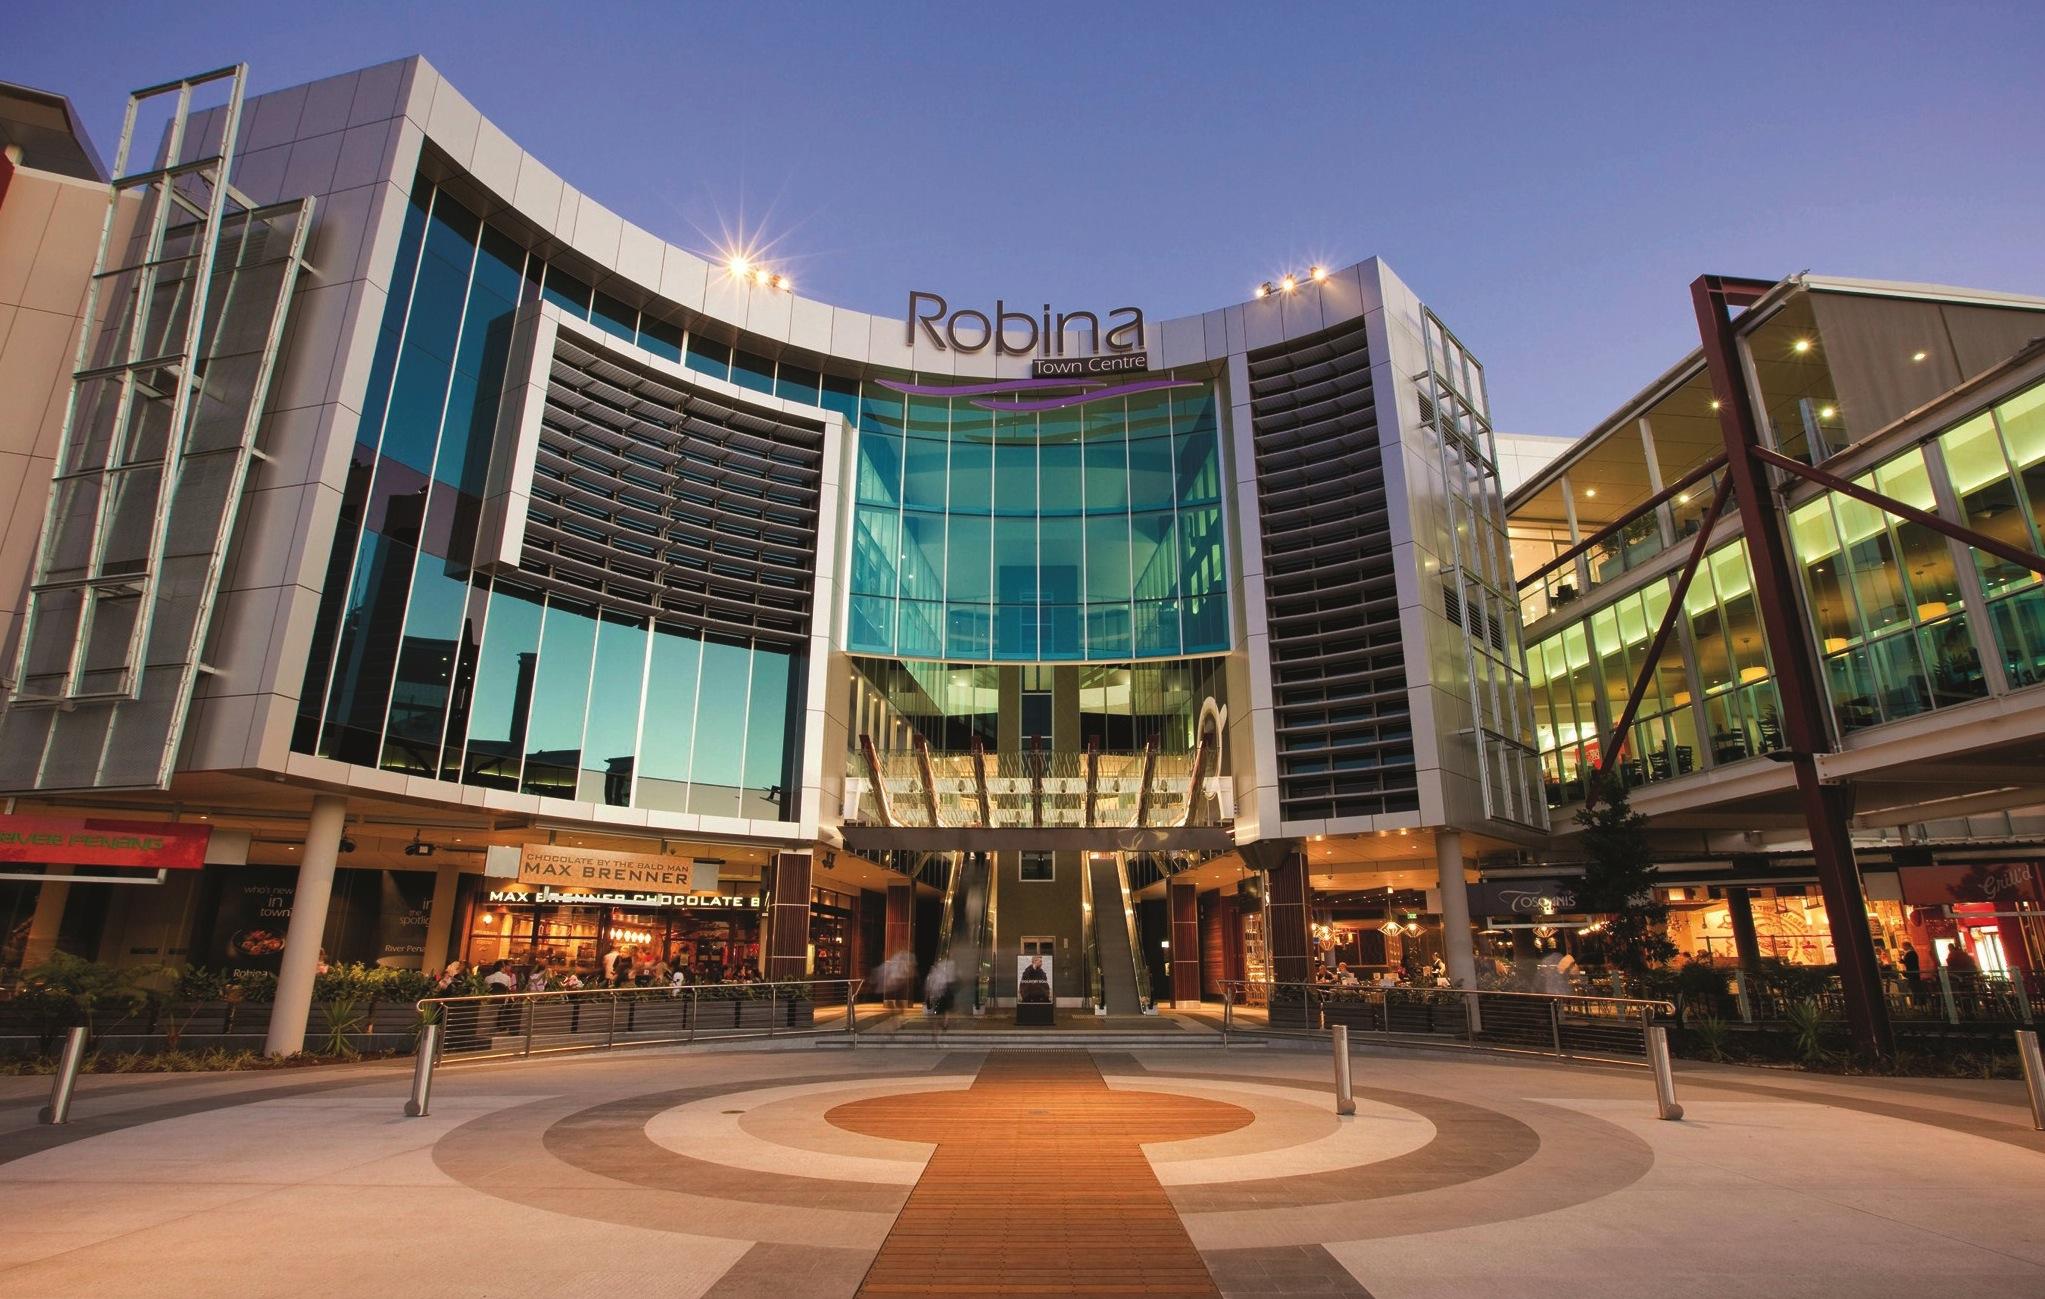 Robina Town Centre, Gold Coast (Image credit: About-Australia.com)